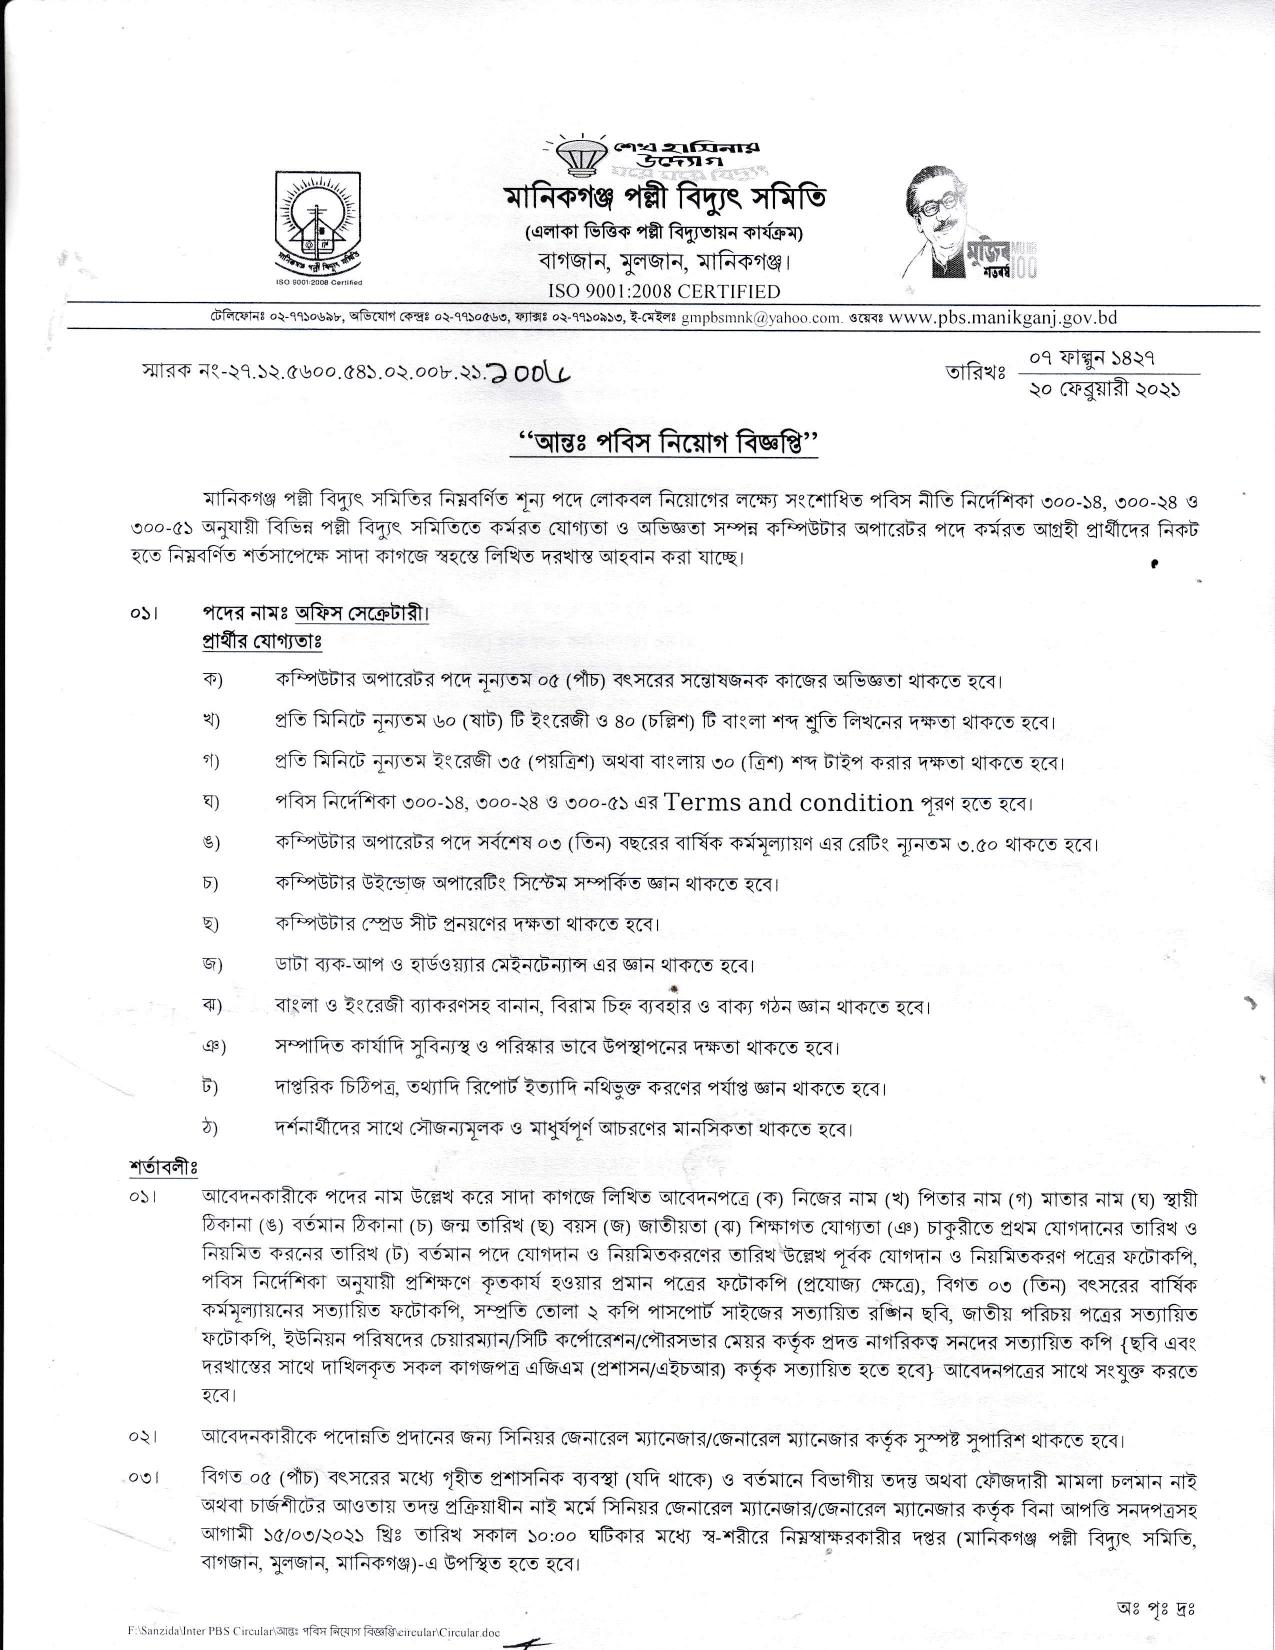 Palli Bidyut Job Circular 2021 - বাংলাদেশ পল্লী বিদ্যুৎ নিয়োগ ২০২১ - পল্লী বিদ্যুৎ নিয়োগ বিজ্ঞপ্তি 2021